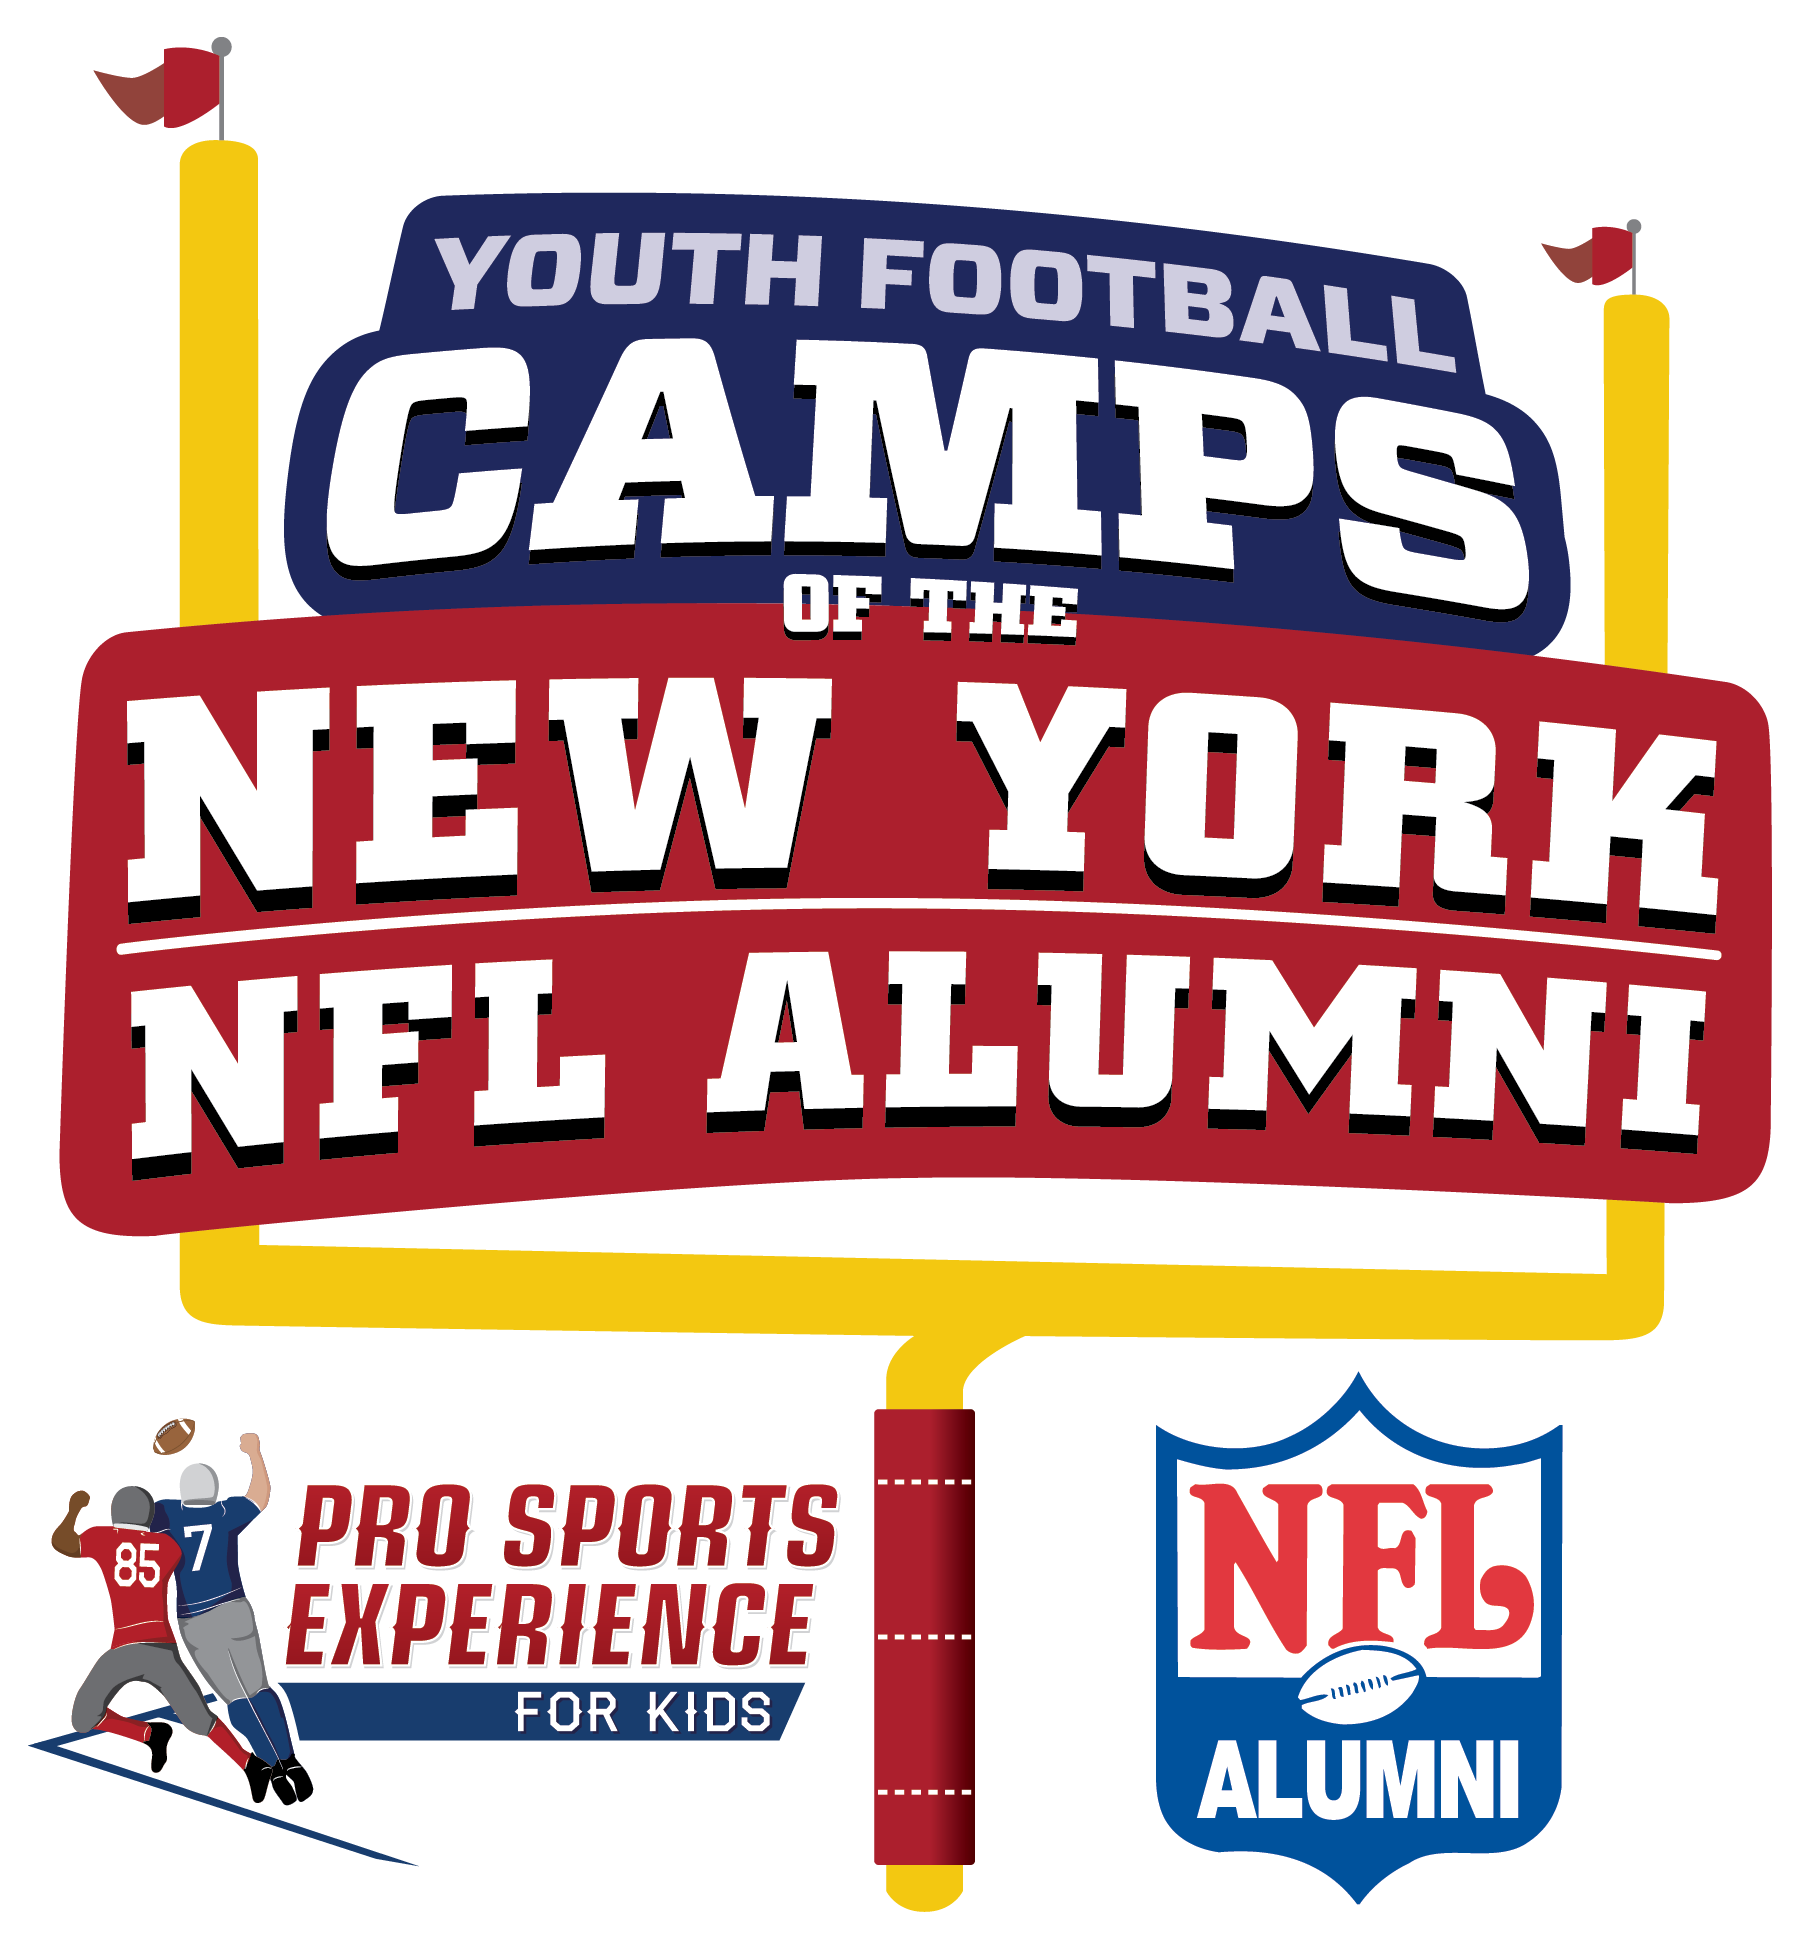 New York NFL Alumni Hero Youth Football Camps - Wallingford